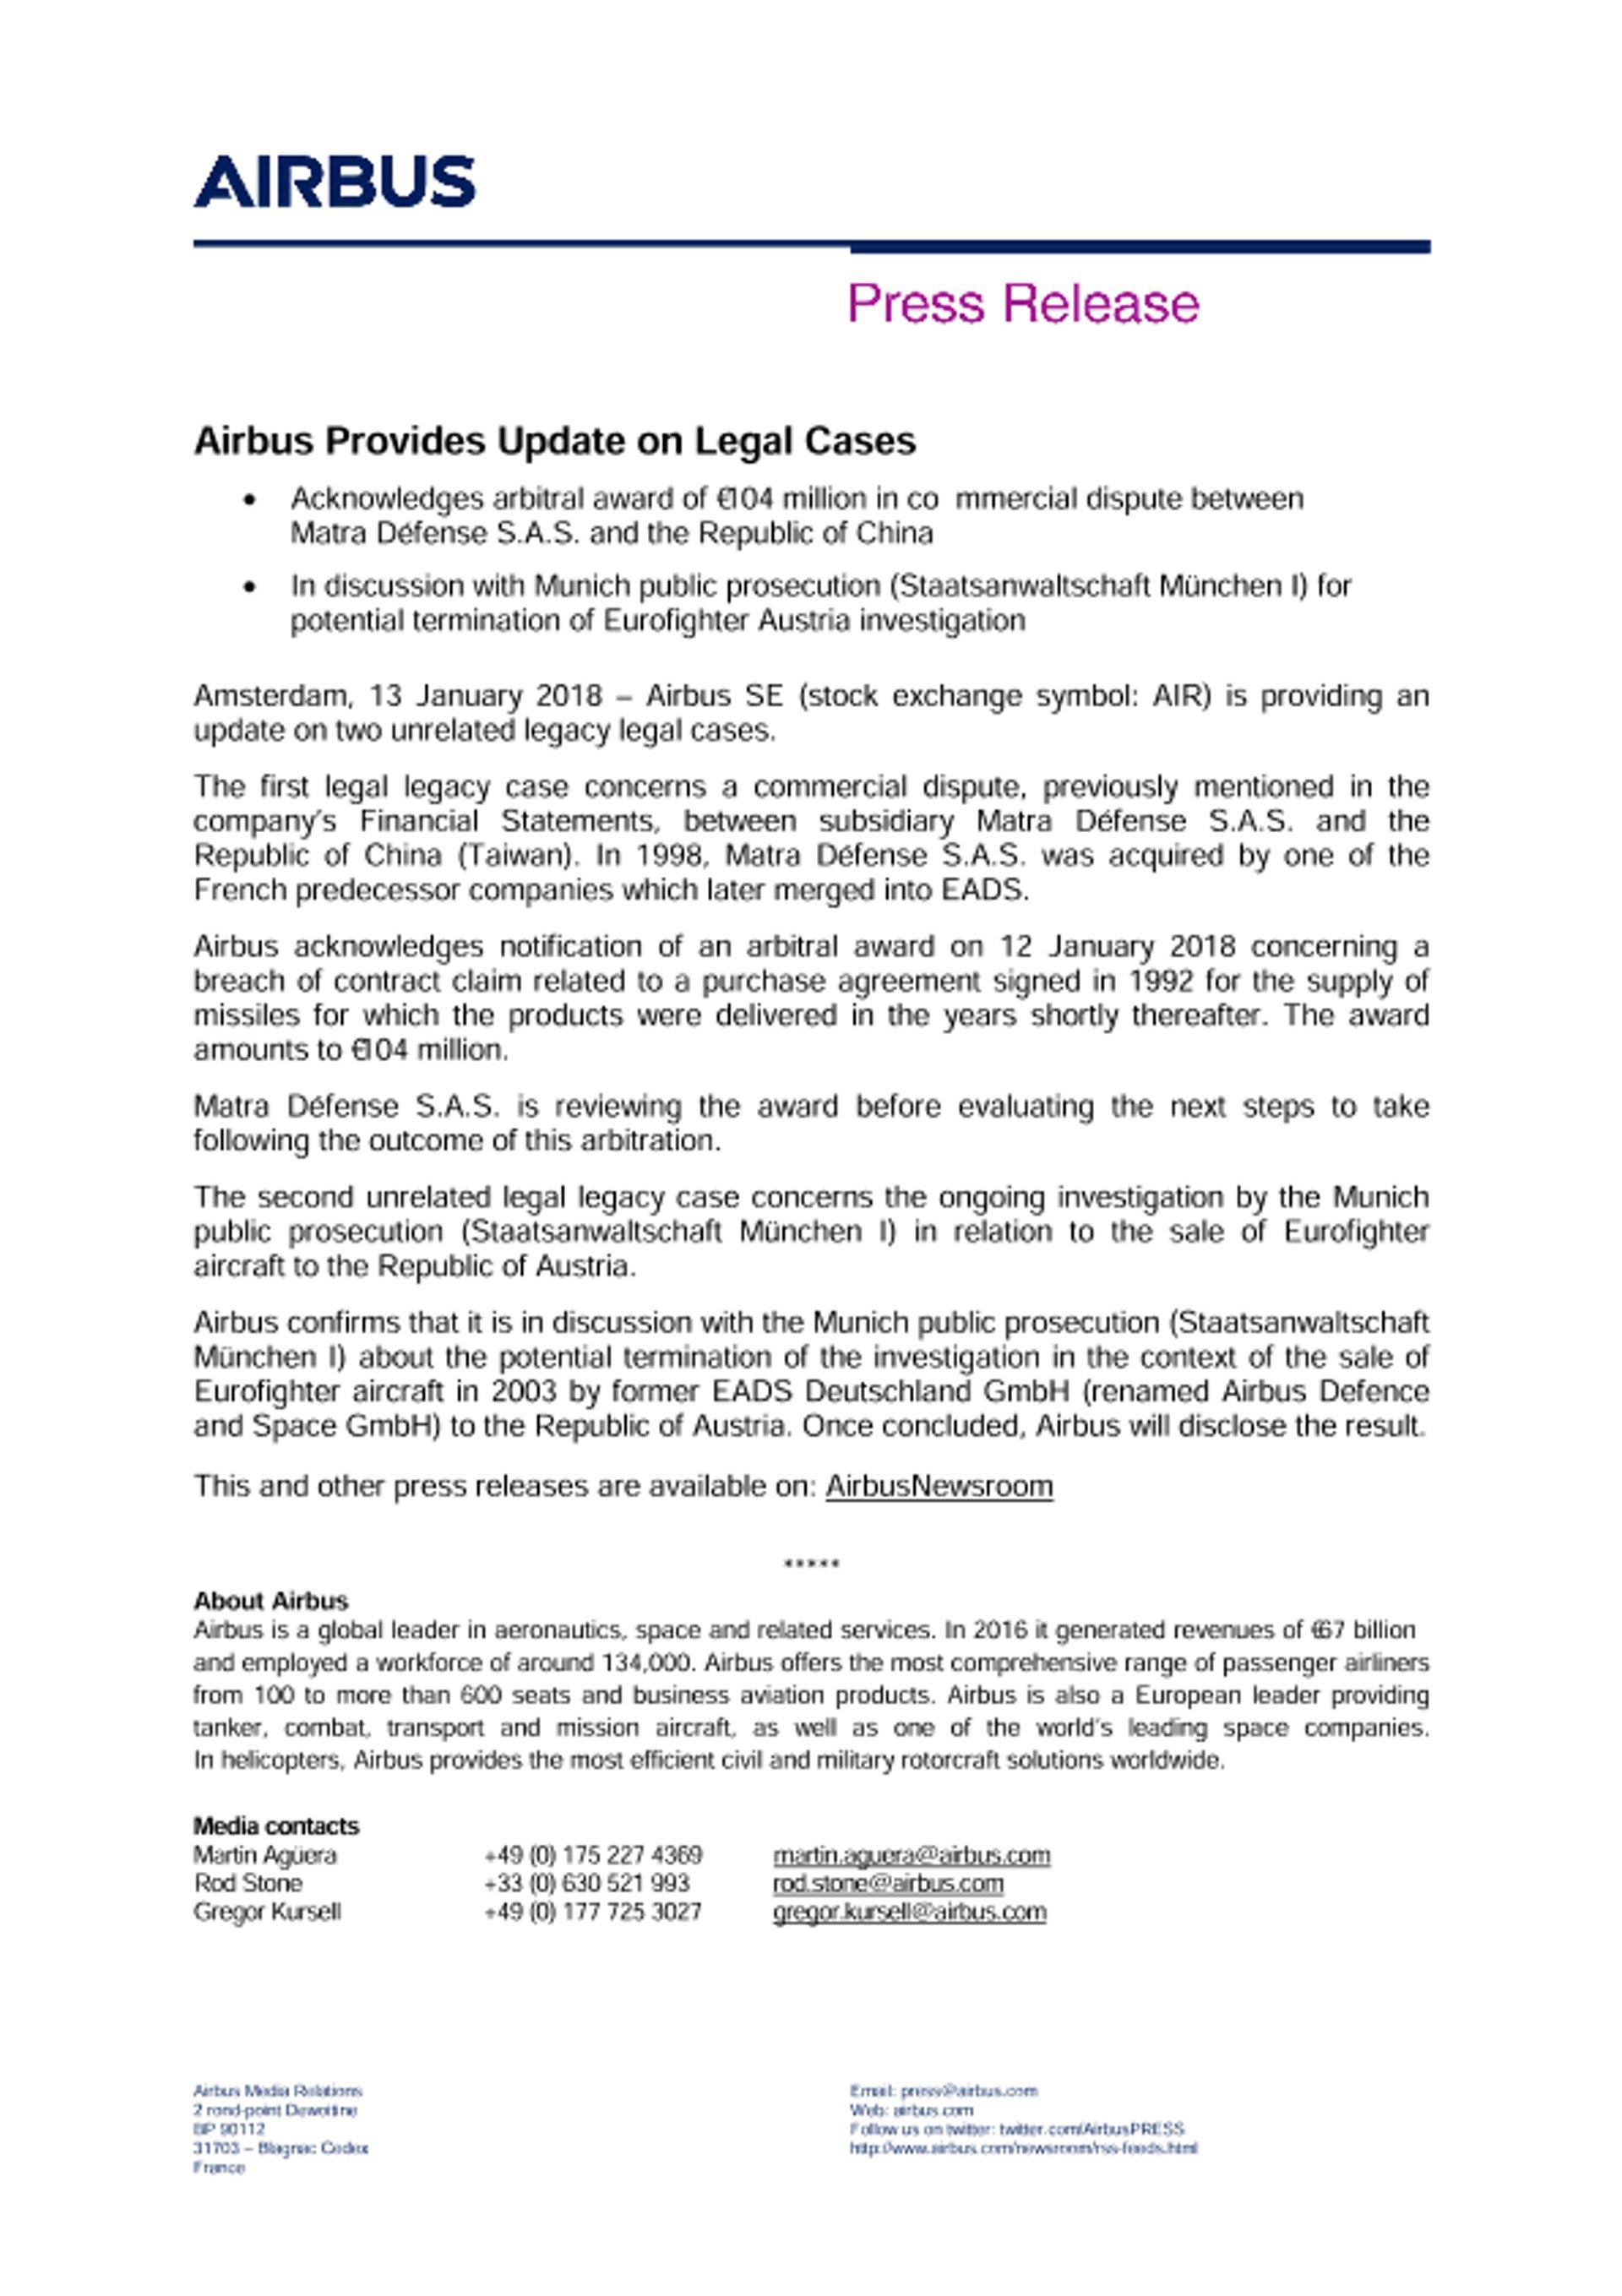 Press Release - Airbus Update on Legal Cases - EN